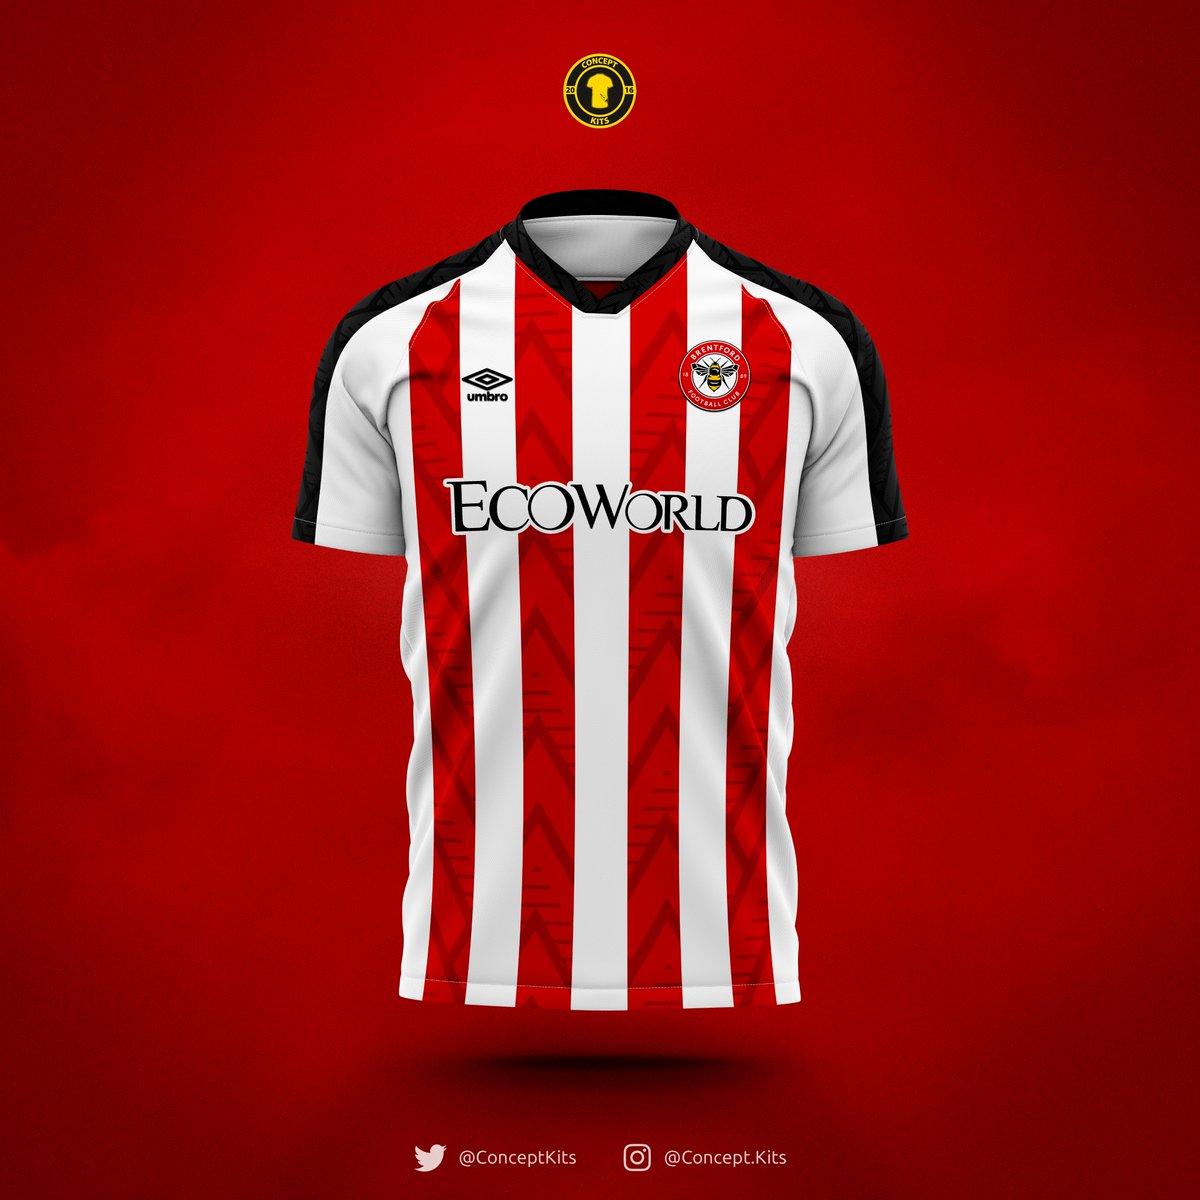 Brentford Football Club home, away and third kit concepts for the 2020/21 season.  #Brentford #BrentfordFC #BFC #Bees #BeesFC #Umbro #EFL #LionelRoad #TheBees #EFL #KitConcept #KitDesign https://t.co/c9RmVHYTsB